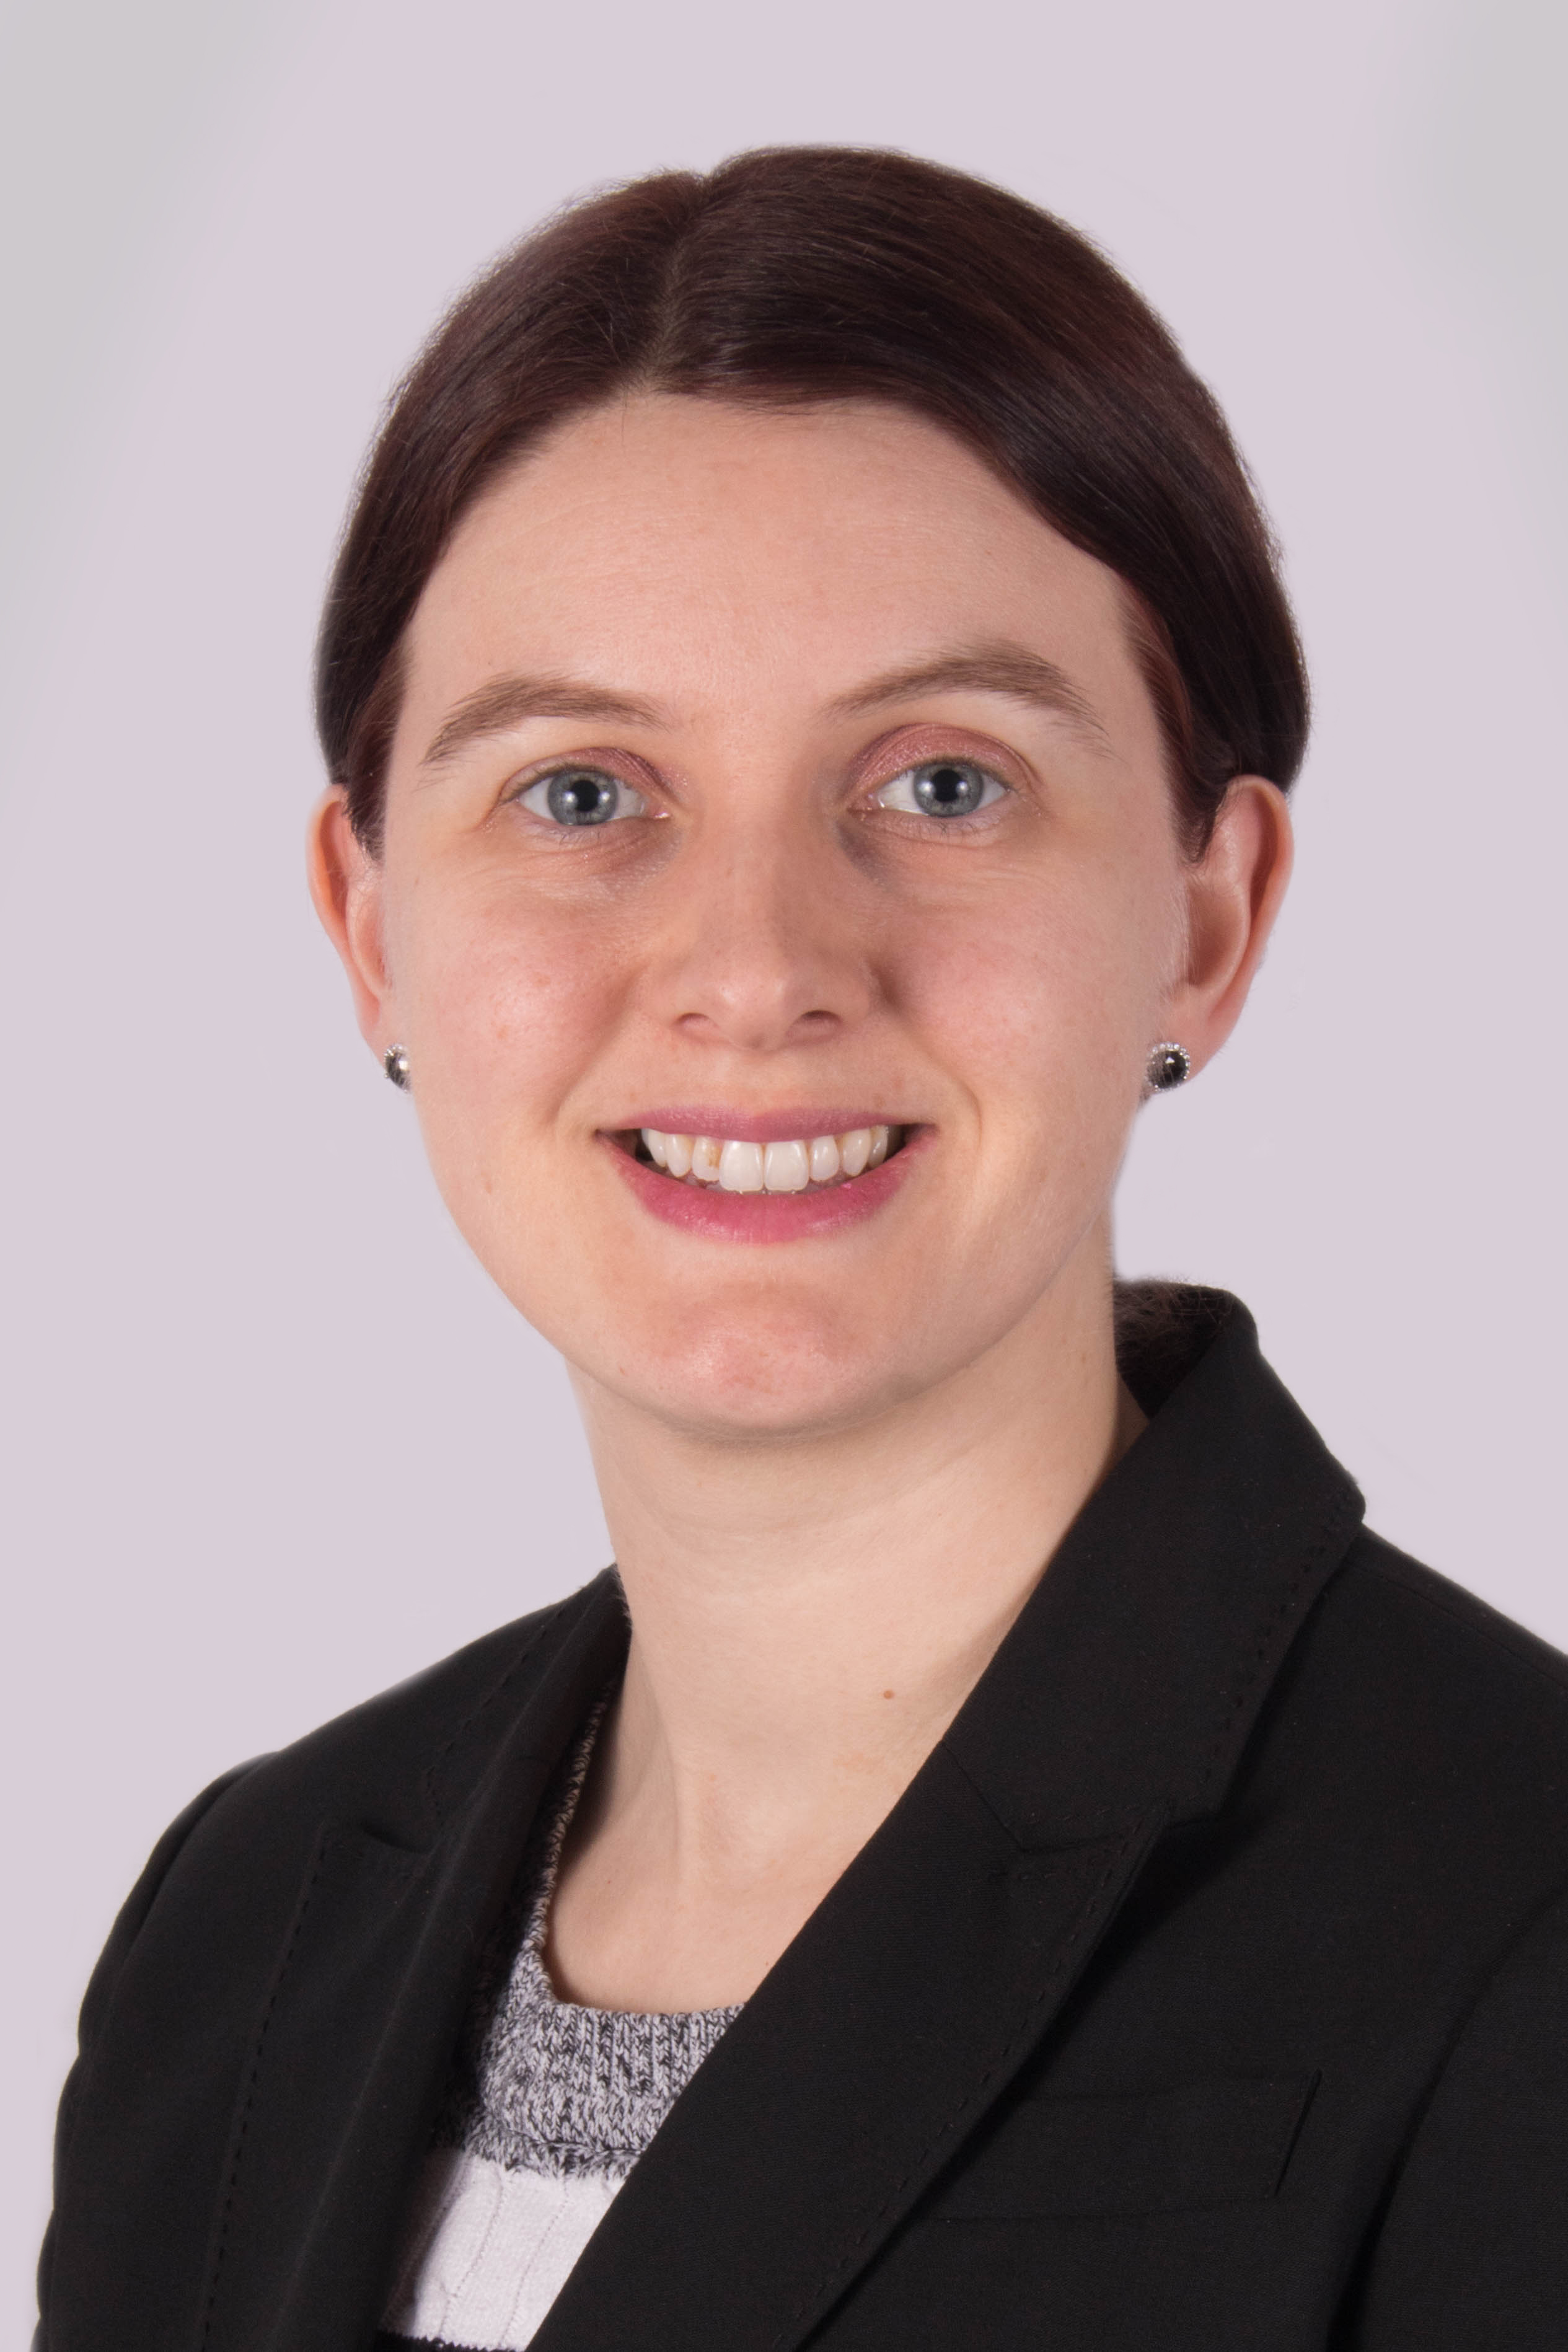 Amelia Corrigan's Professional Headshot